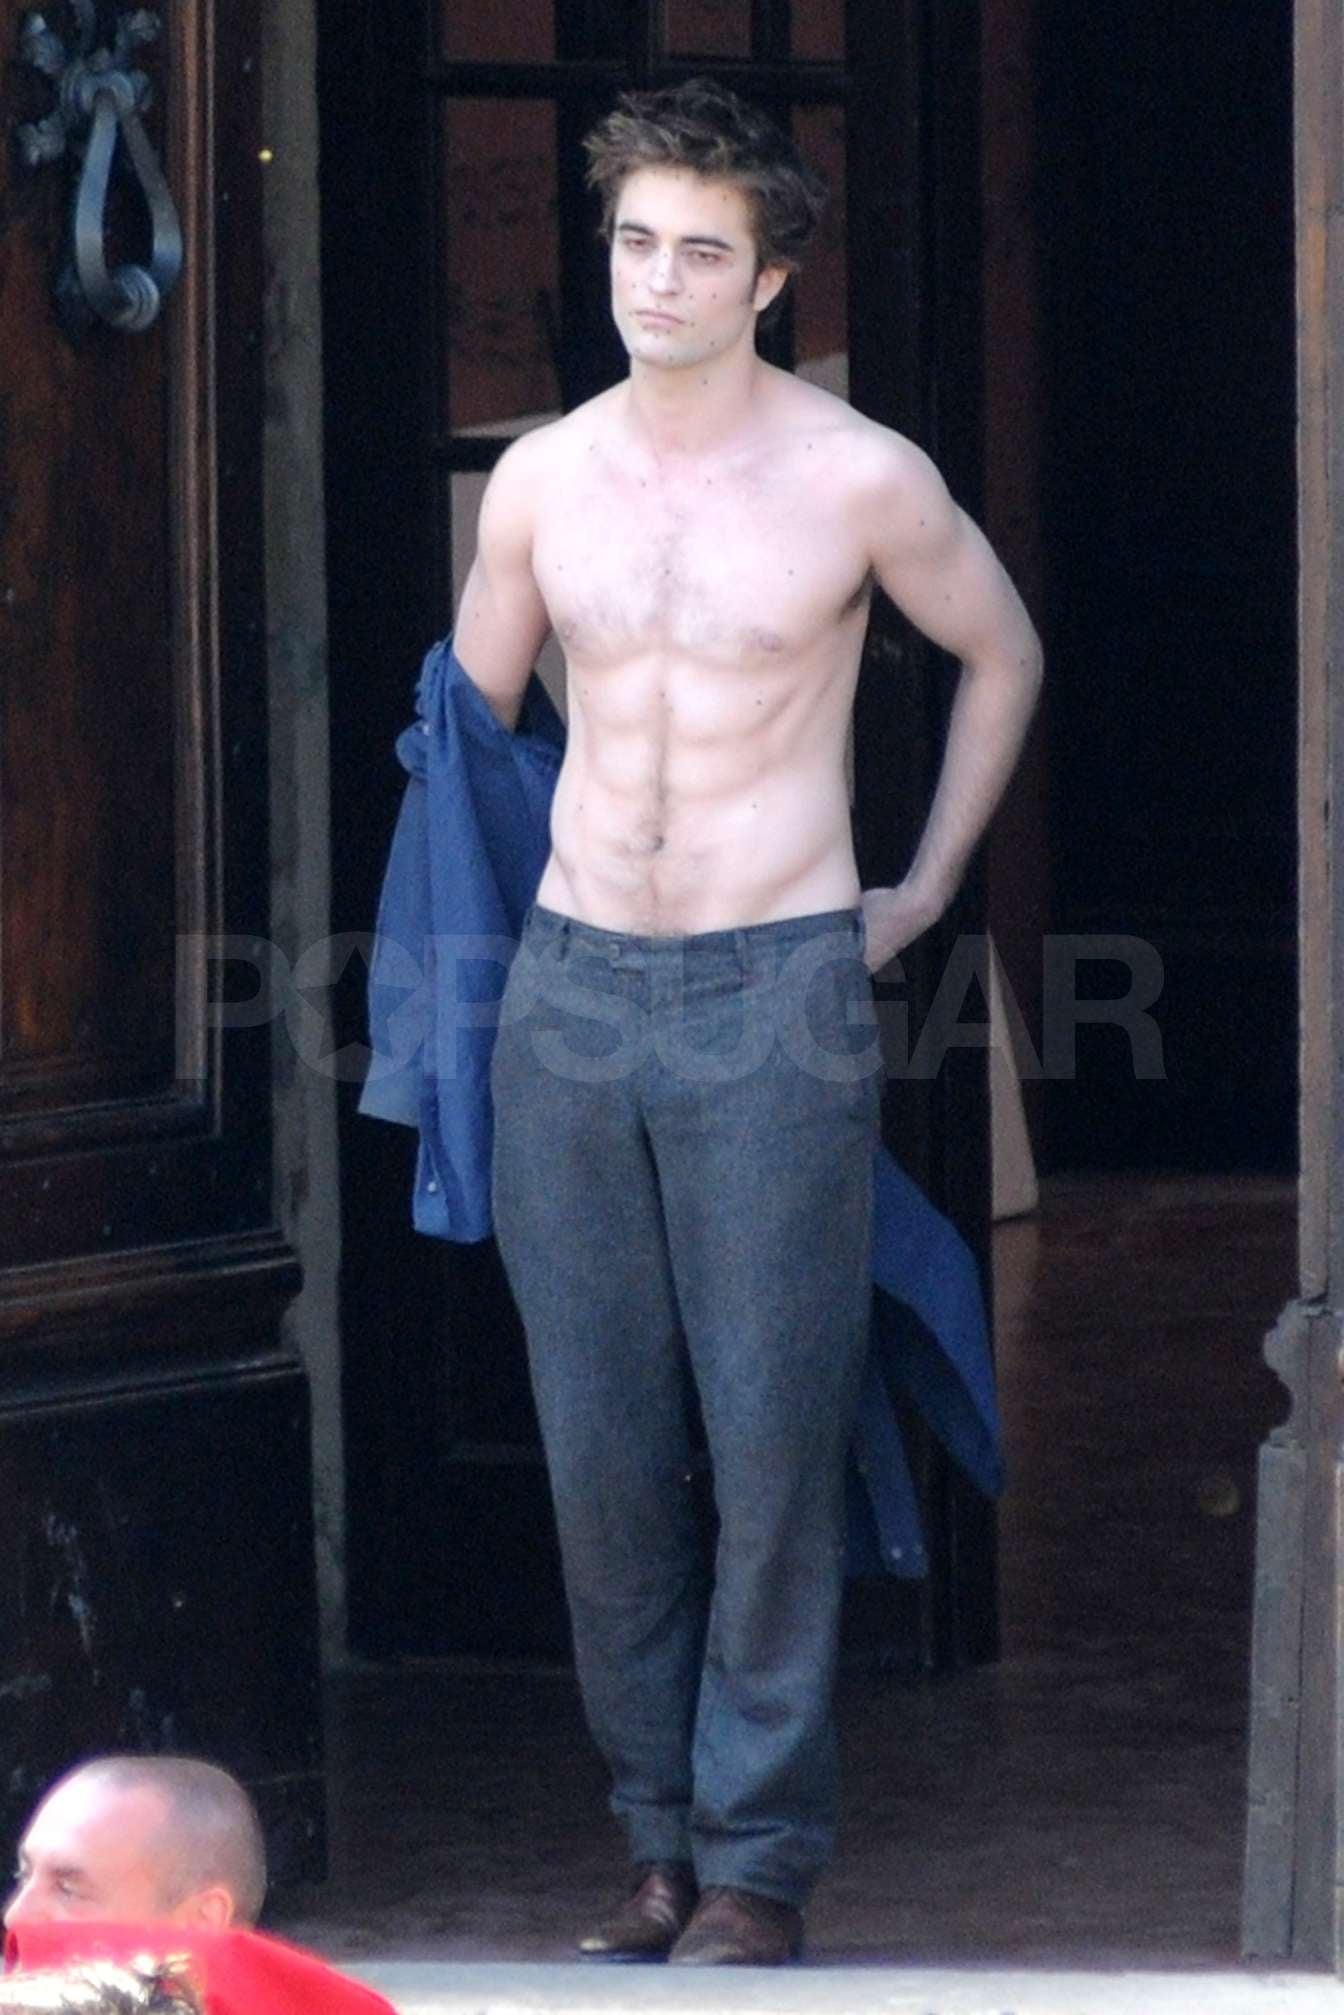 Shirtless Photos of Robert Pattinson Kissing Kristen Stewart on the Set of New Moon